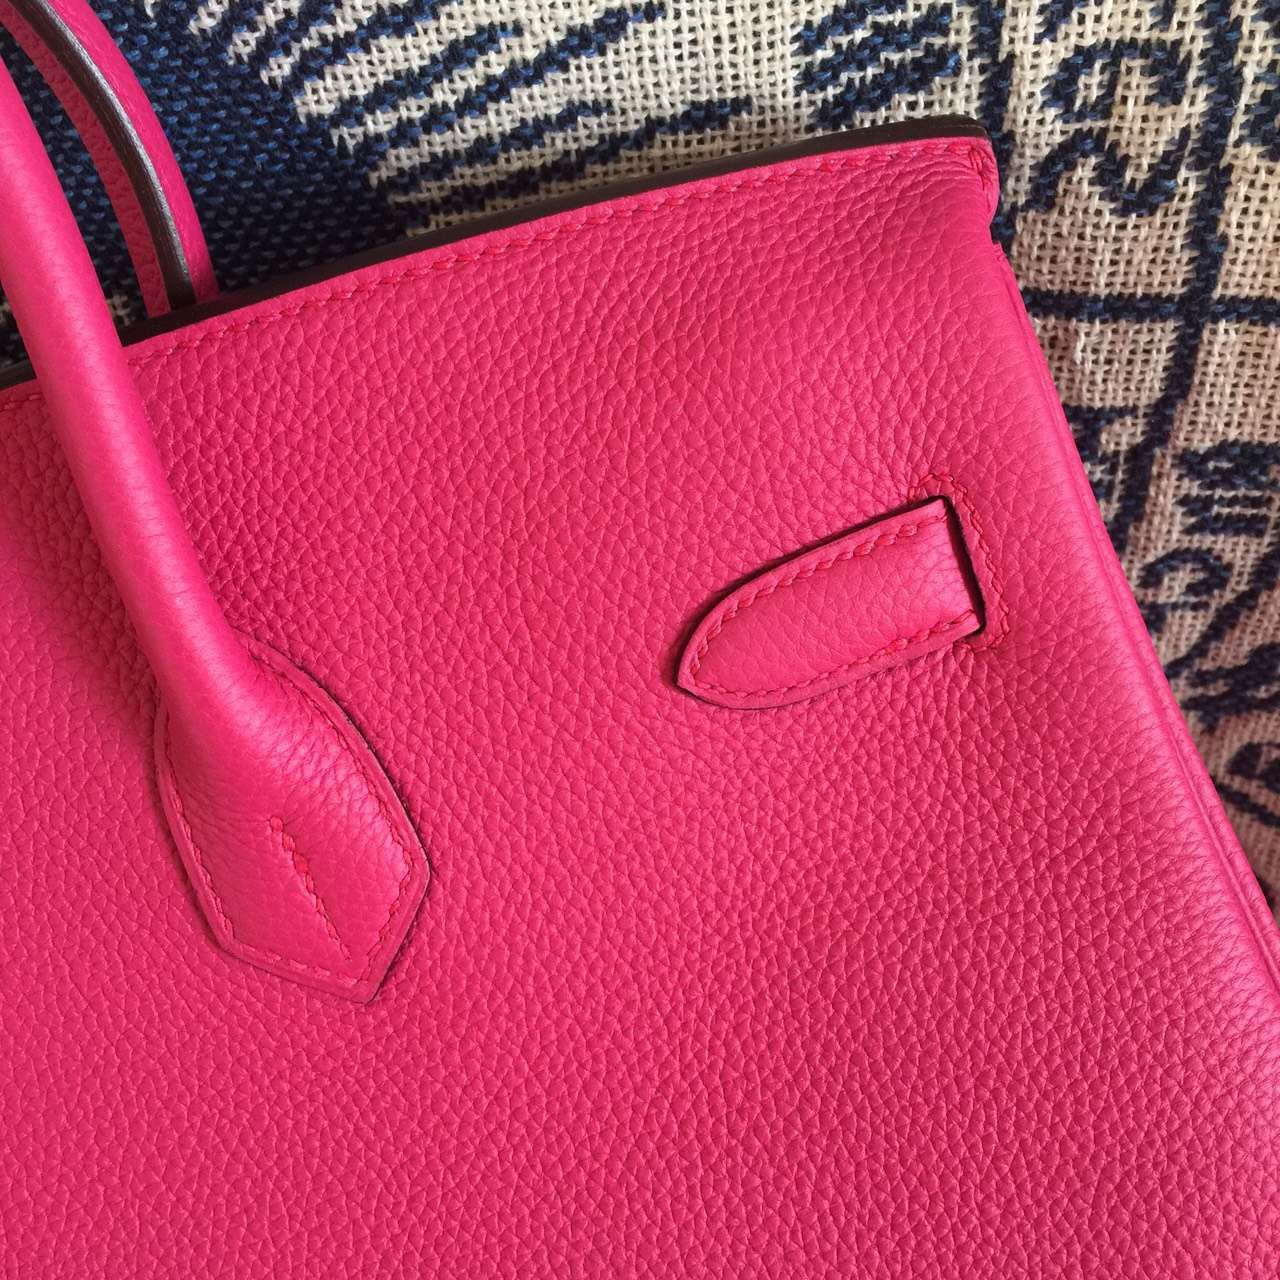 Discount Hermes Birkin30CM 5J Hot Pink Togo Calfskin Leather Women's Tote Bag